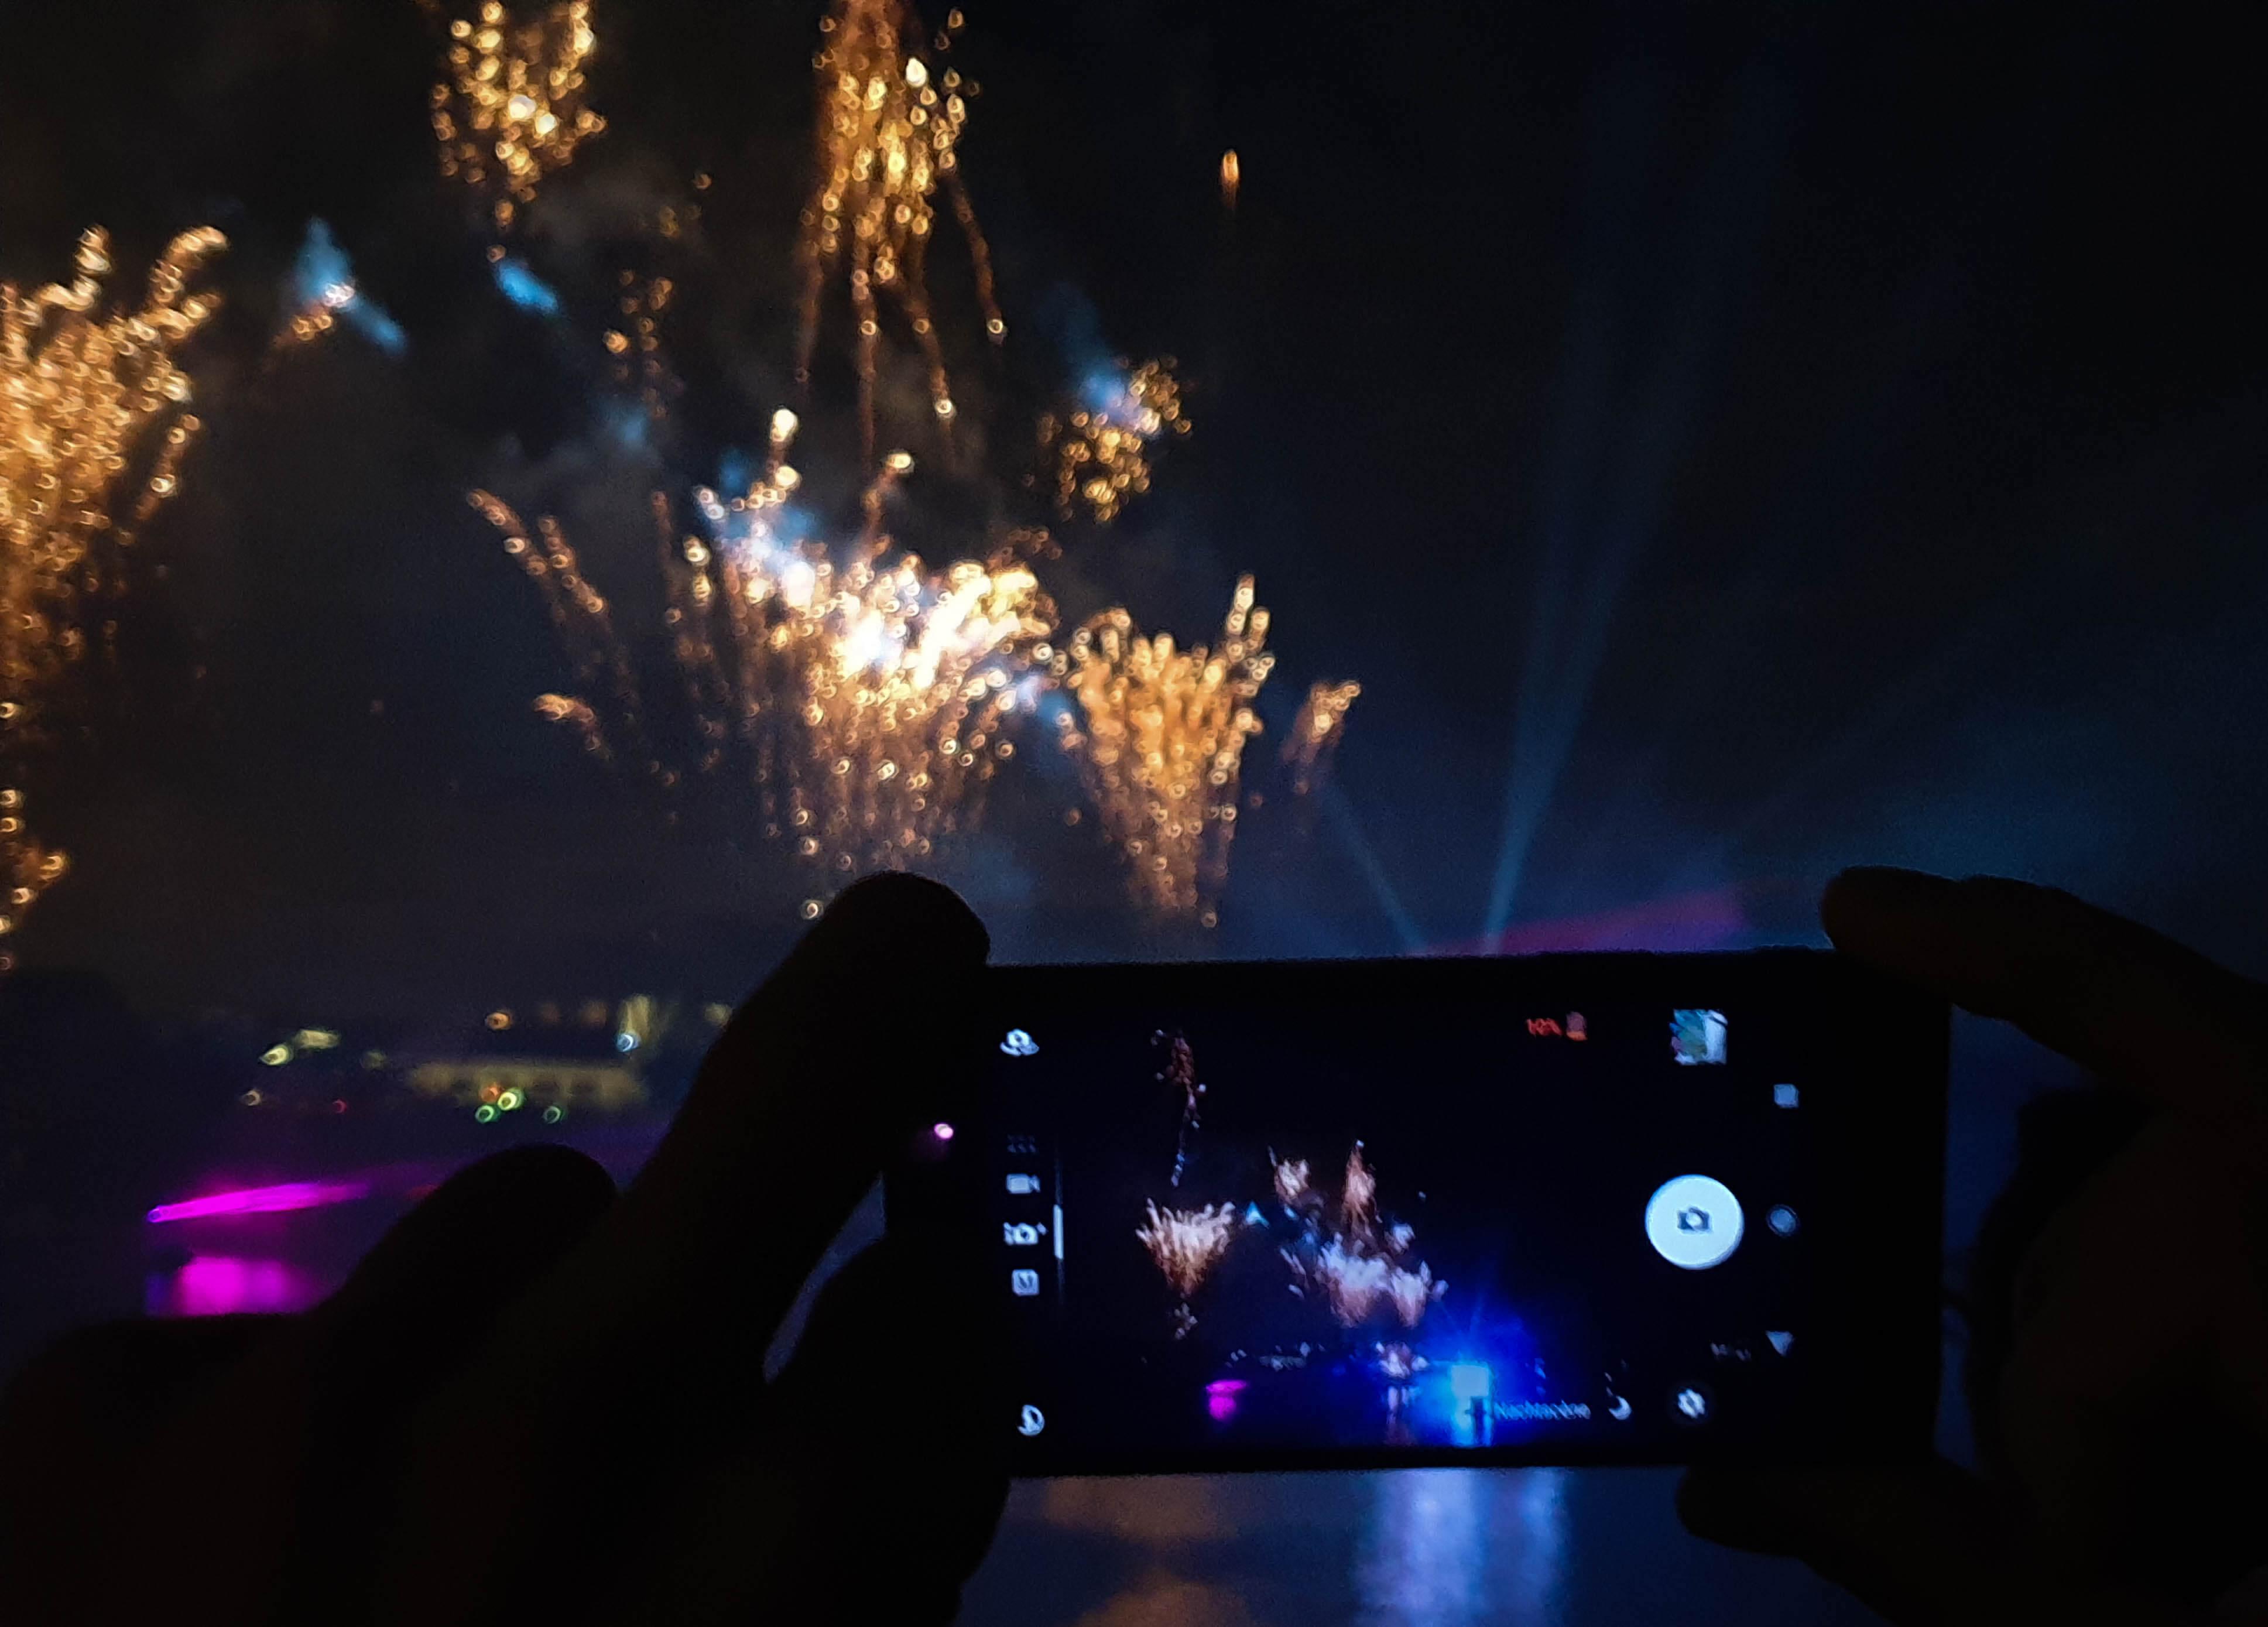 Vuurwerkfestival Disney - Frozen januari